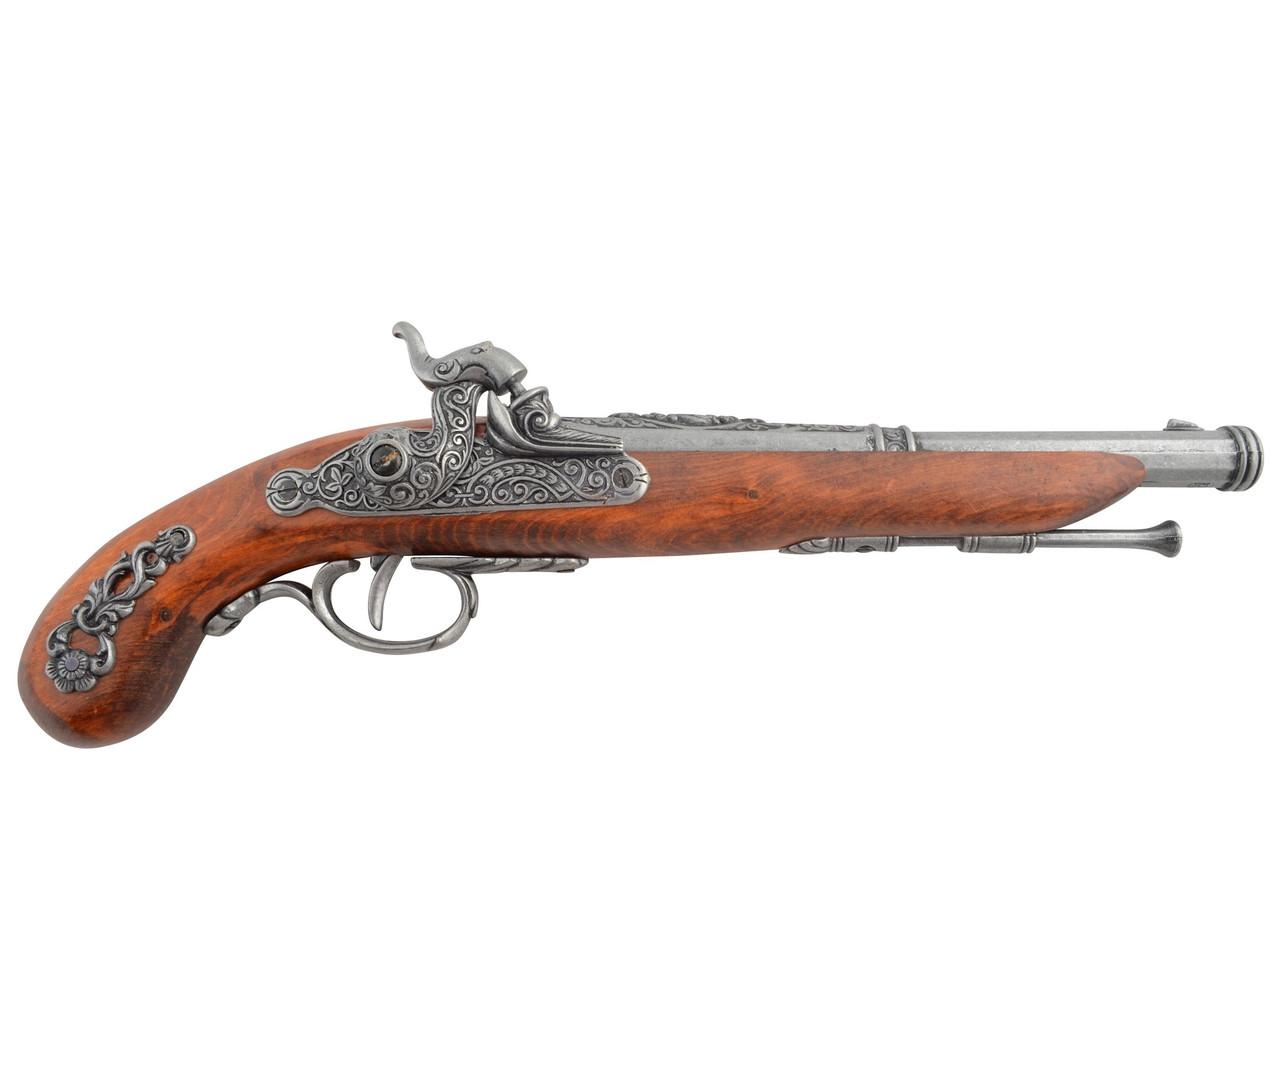 Макет пістолет крем'яний, сталь (Франція, 1872 р.) (DA)